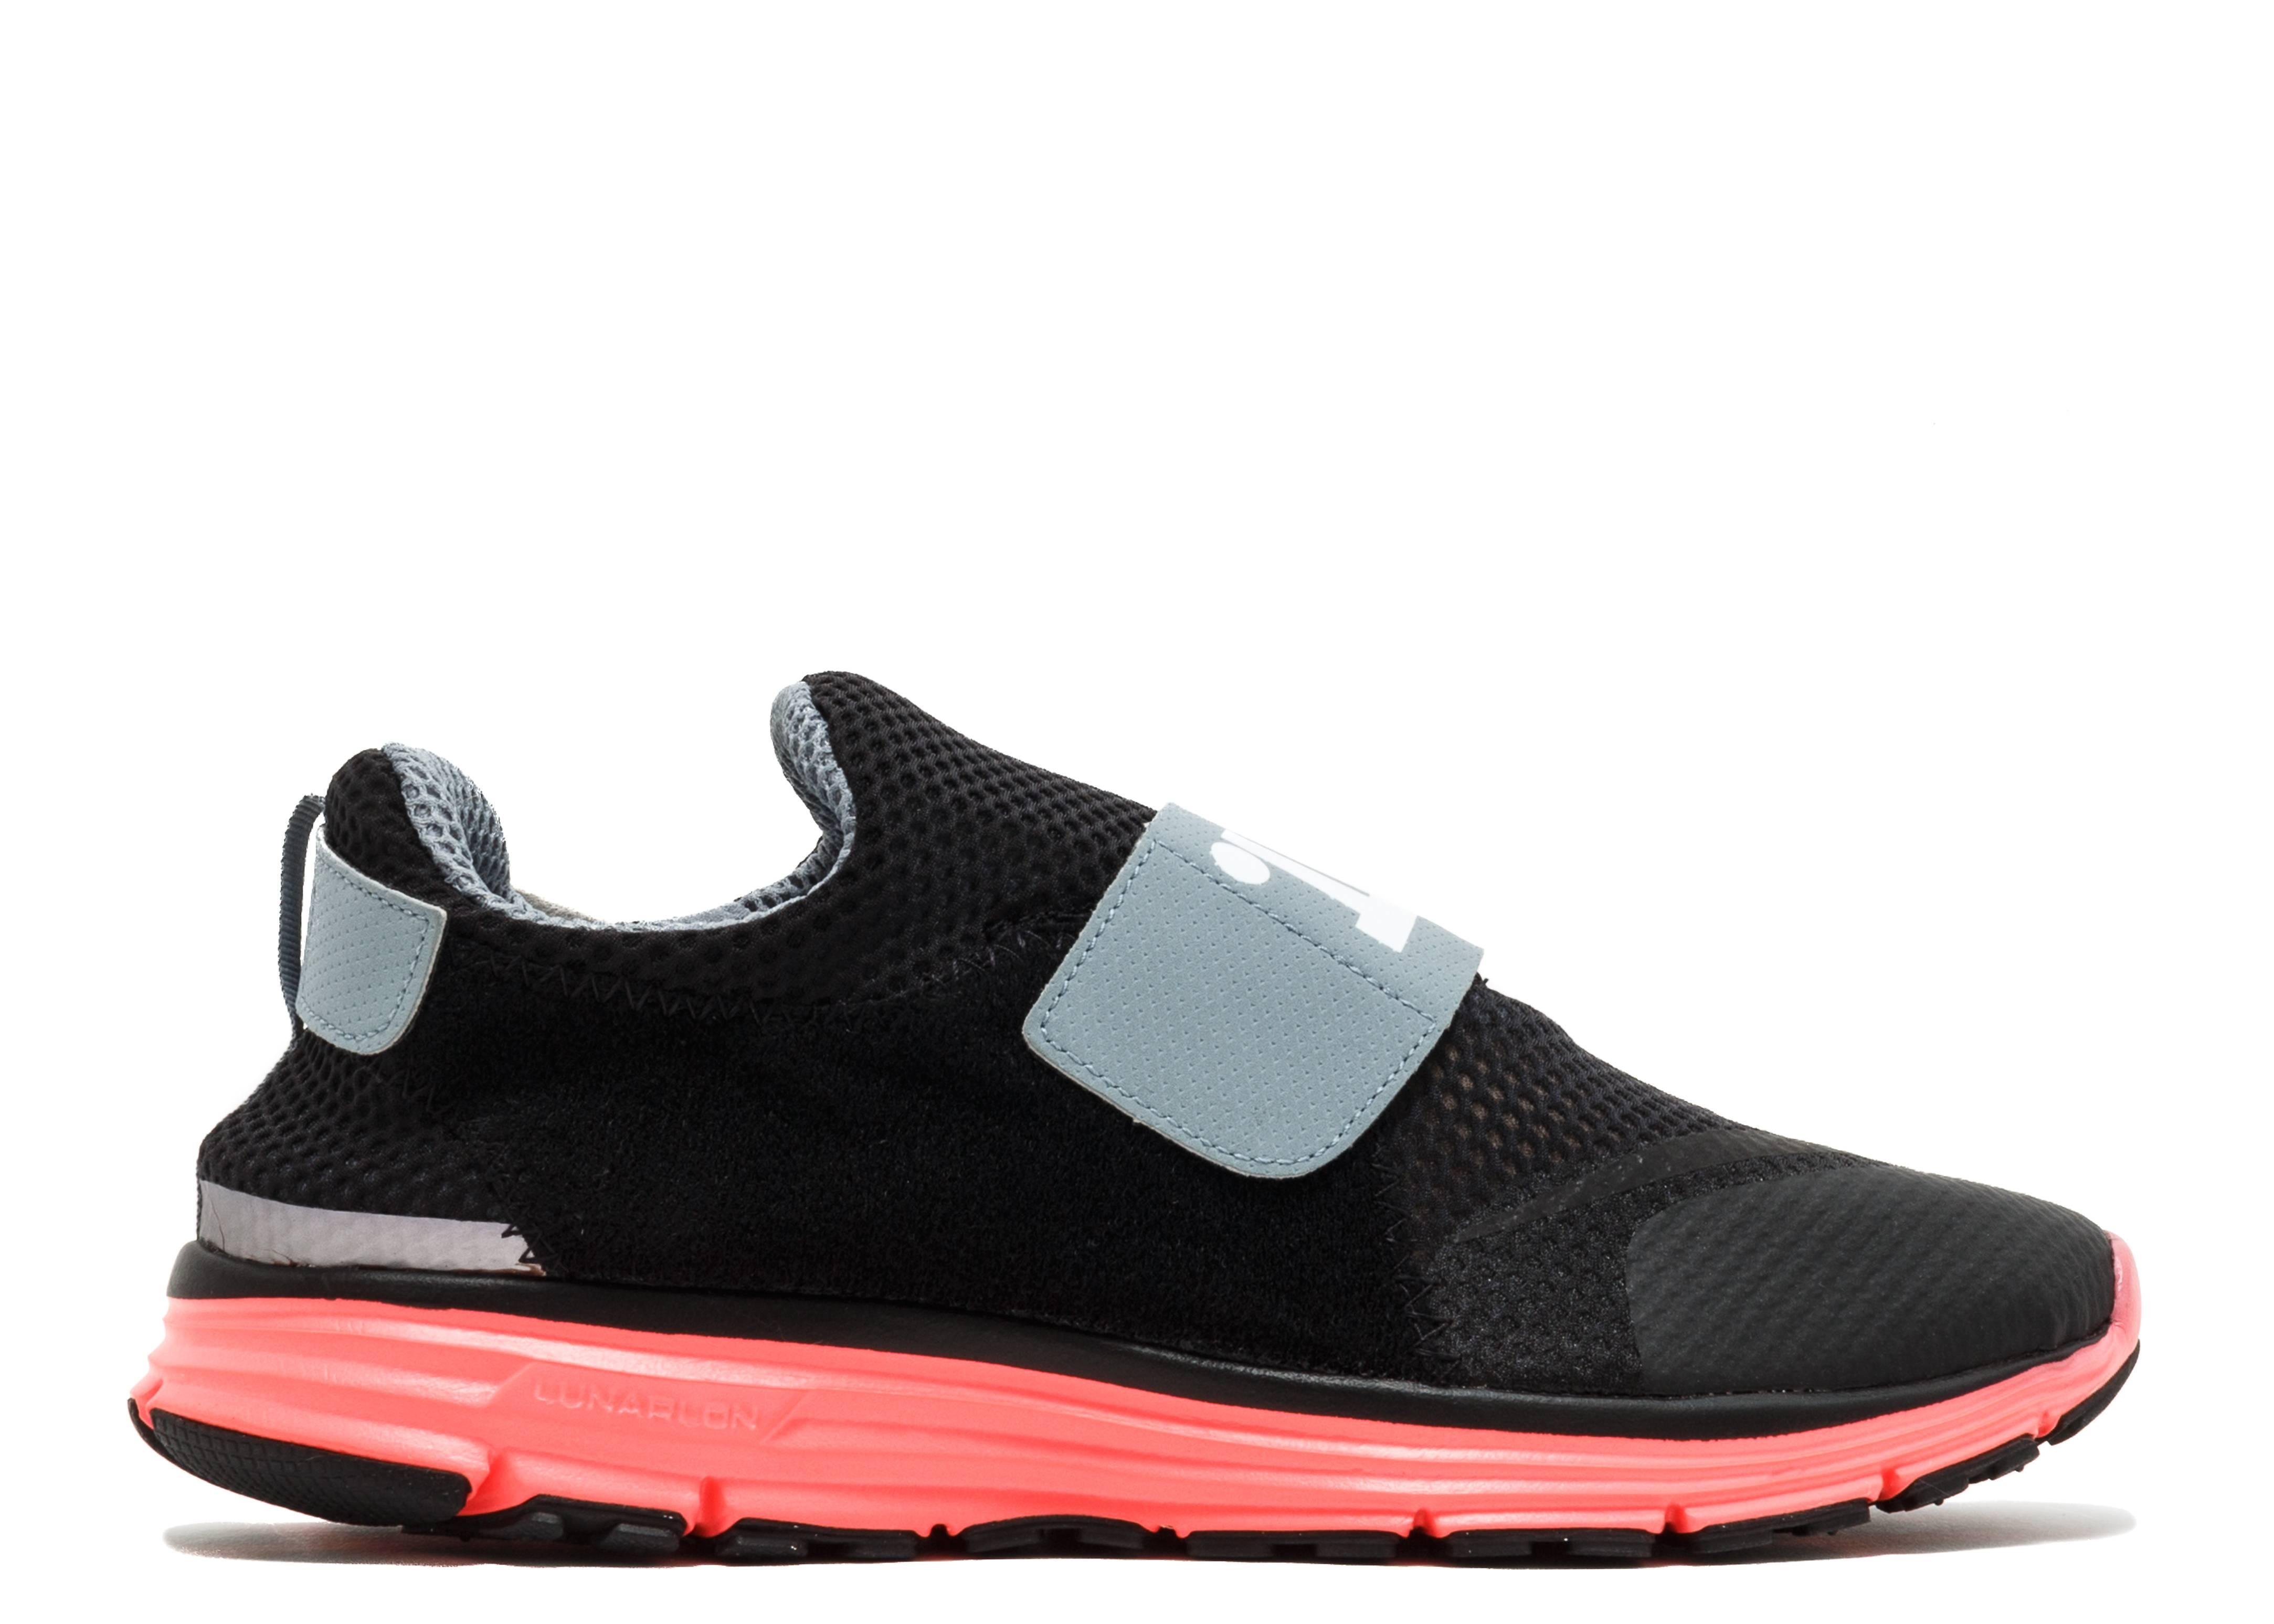 Nike Lunarfly 306 - Nike - 644395 002 - black white-mgnt gry-hypr pnch  c40d60a1e9